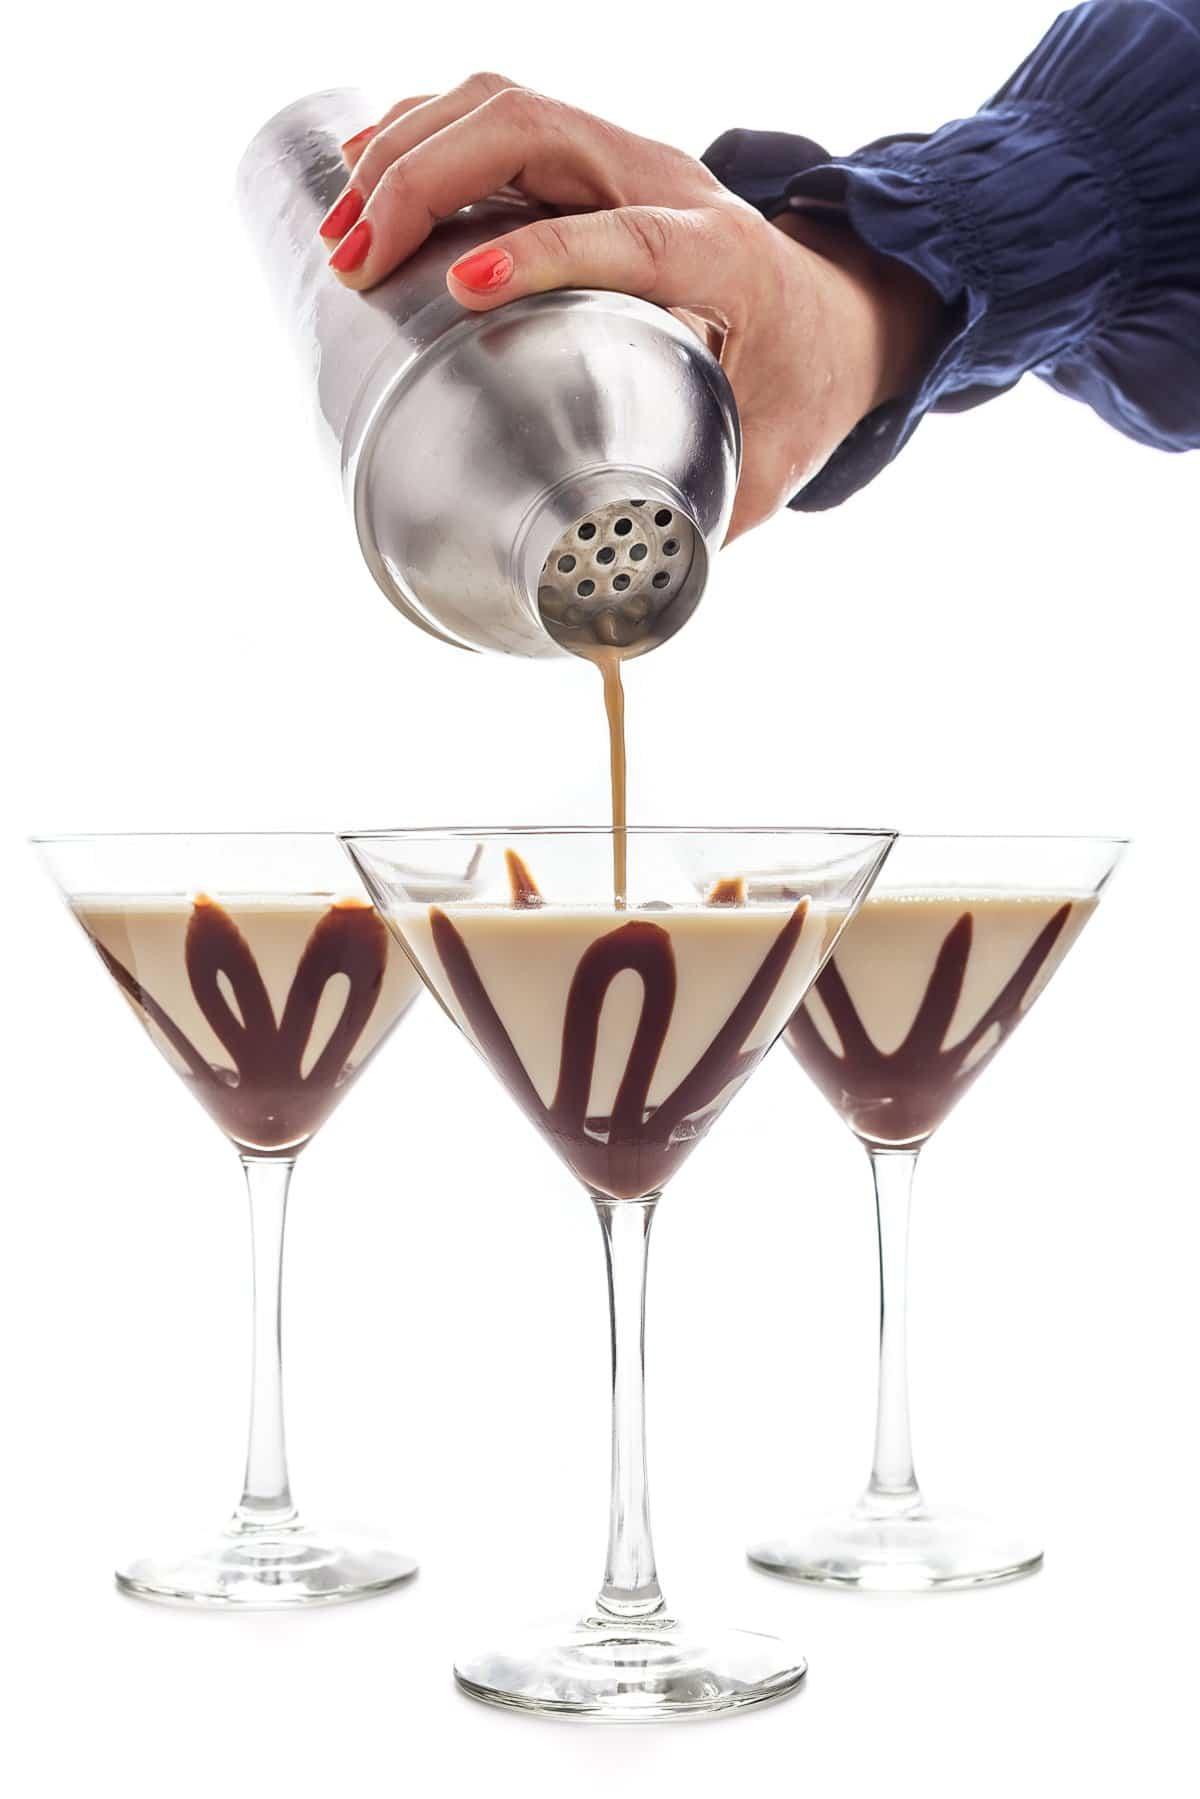 Liz pouring a chocolate martini